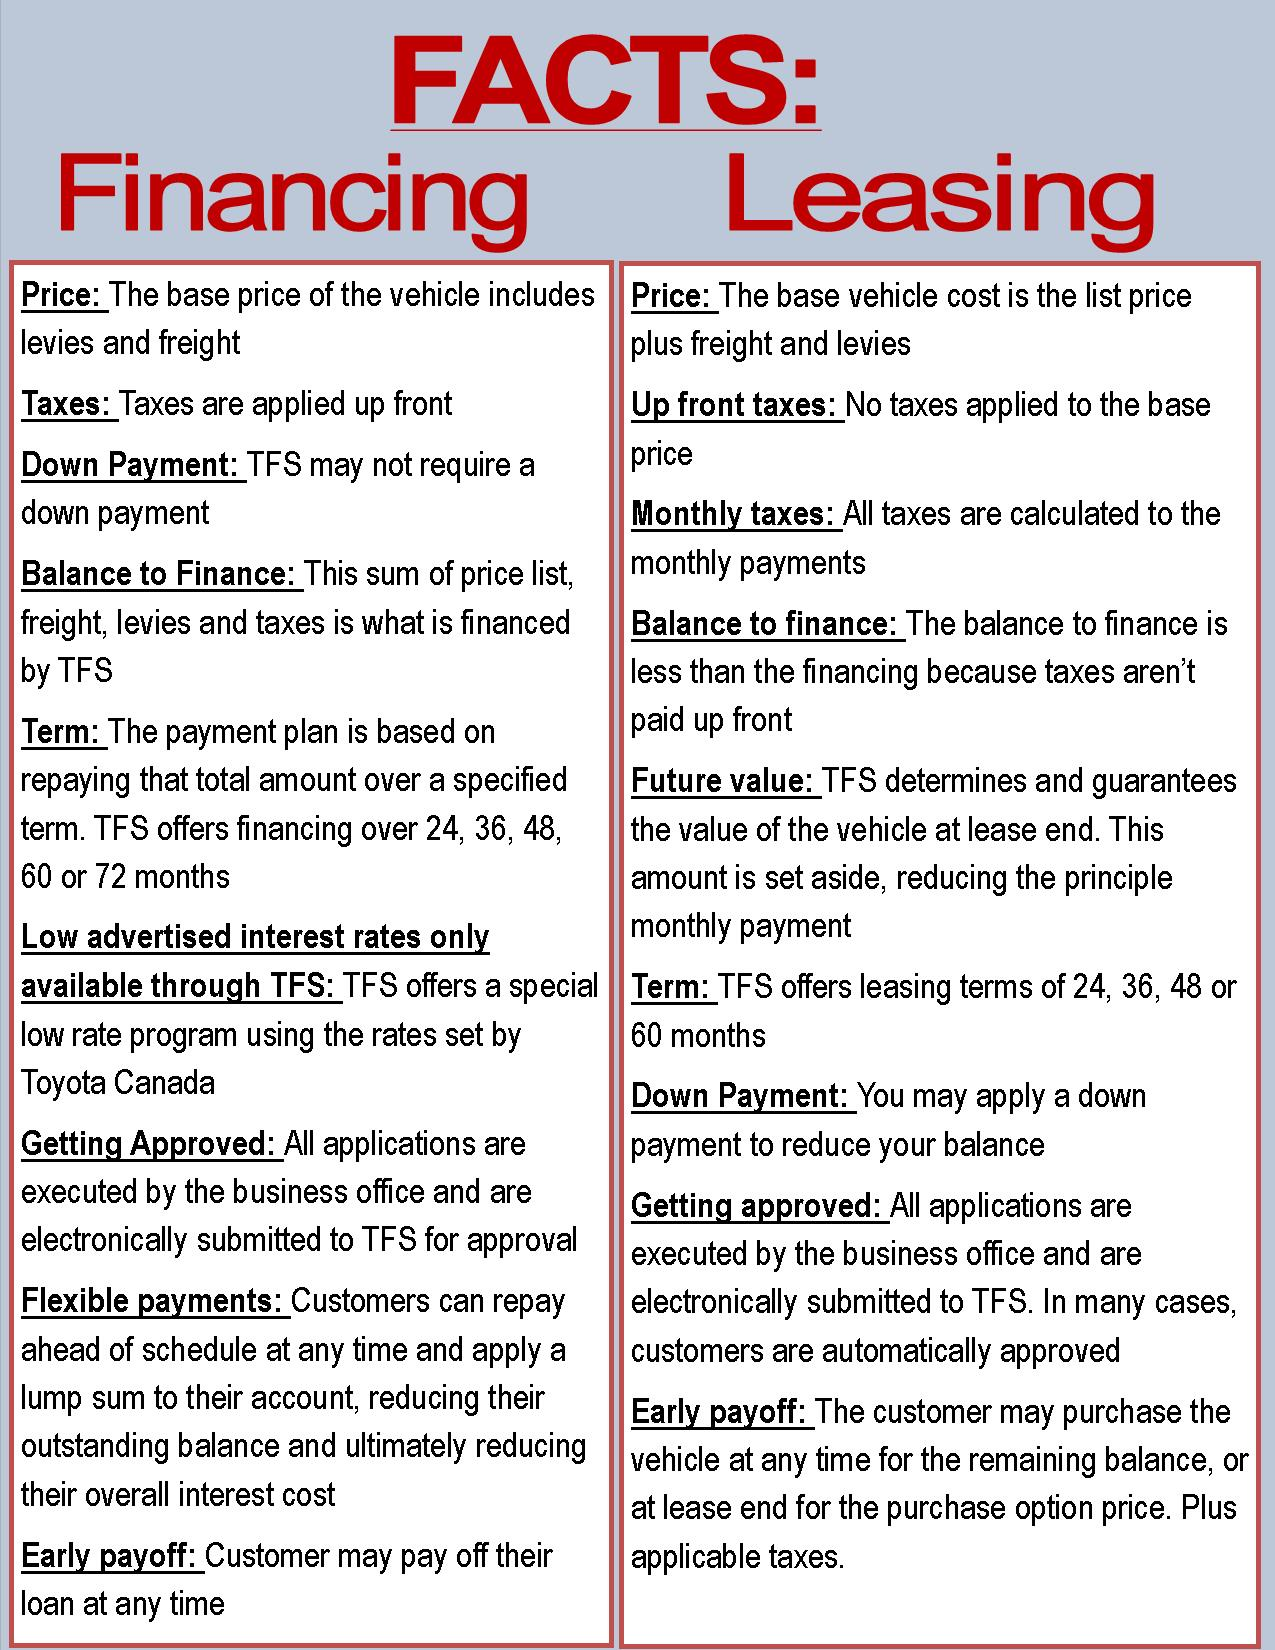 Benefits Of Financing: